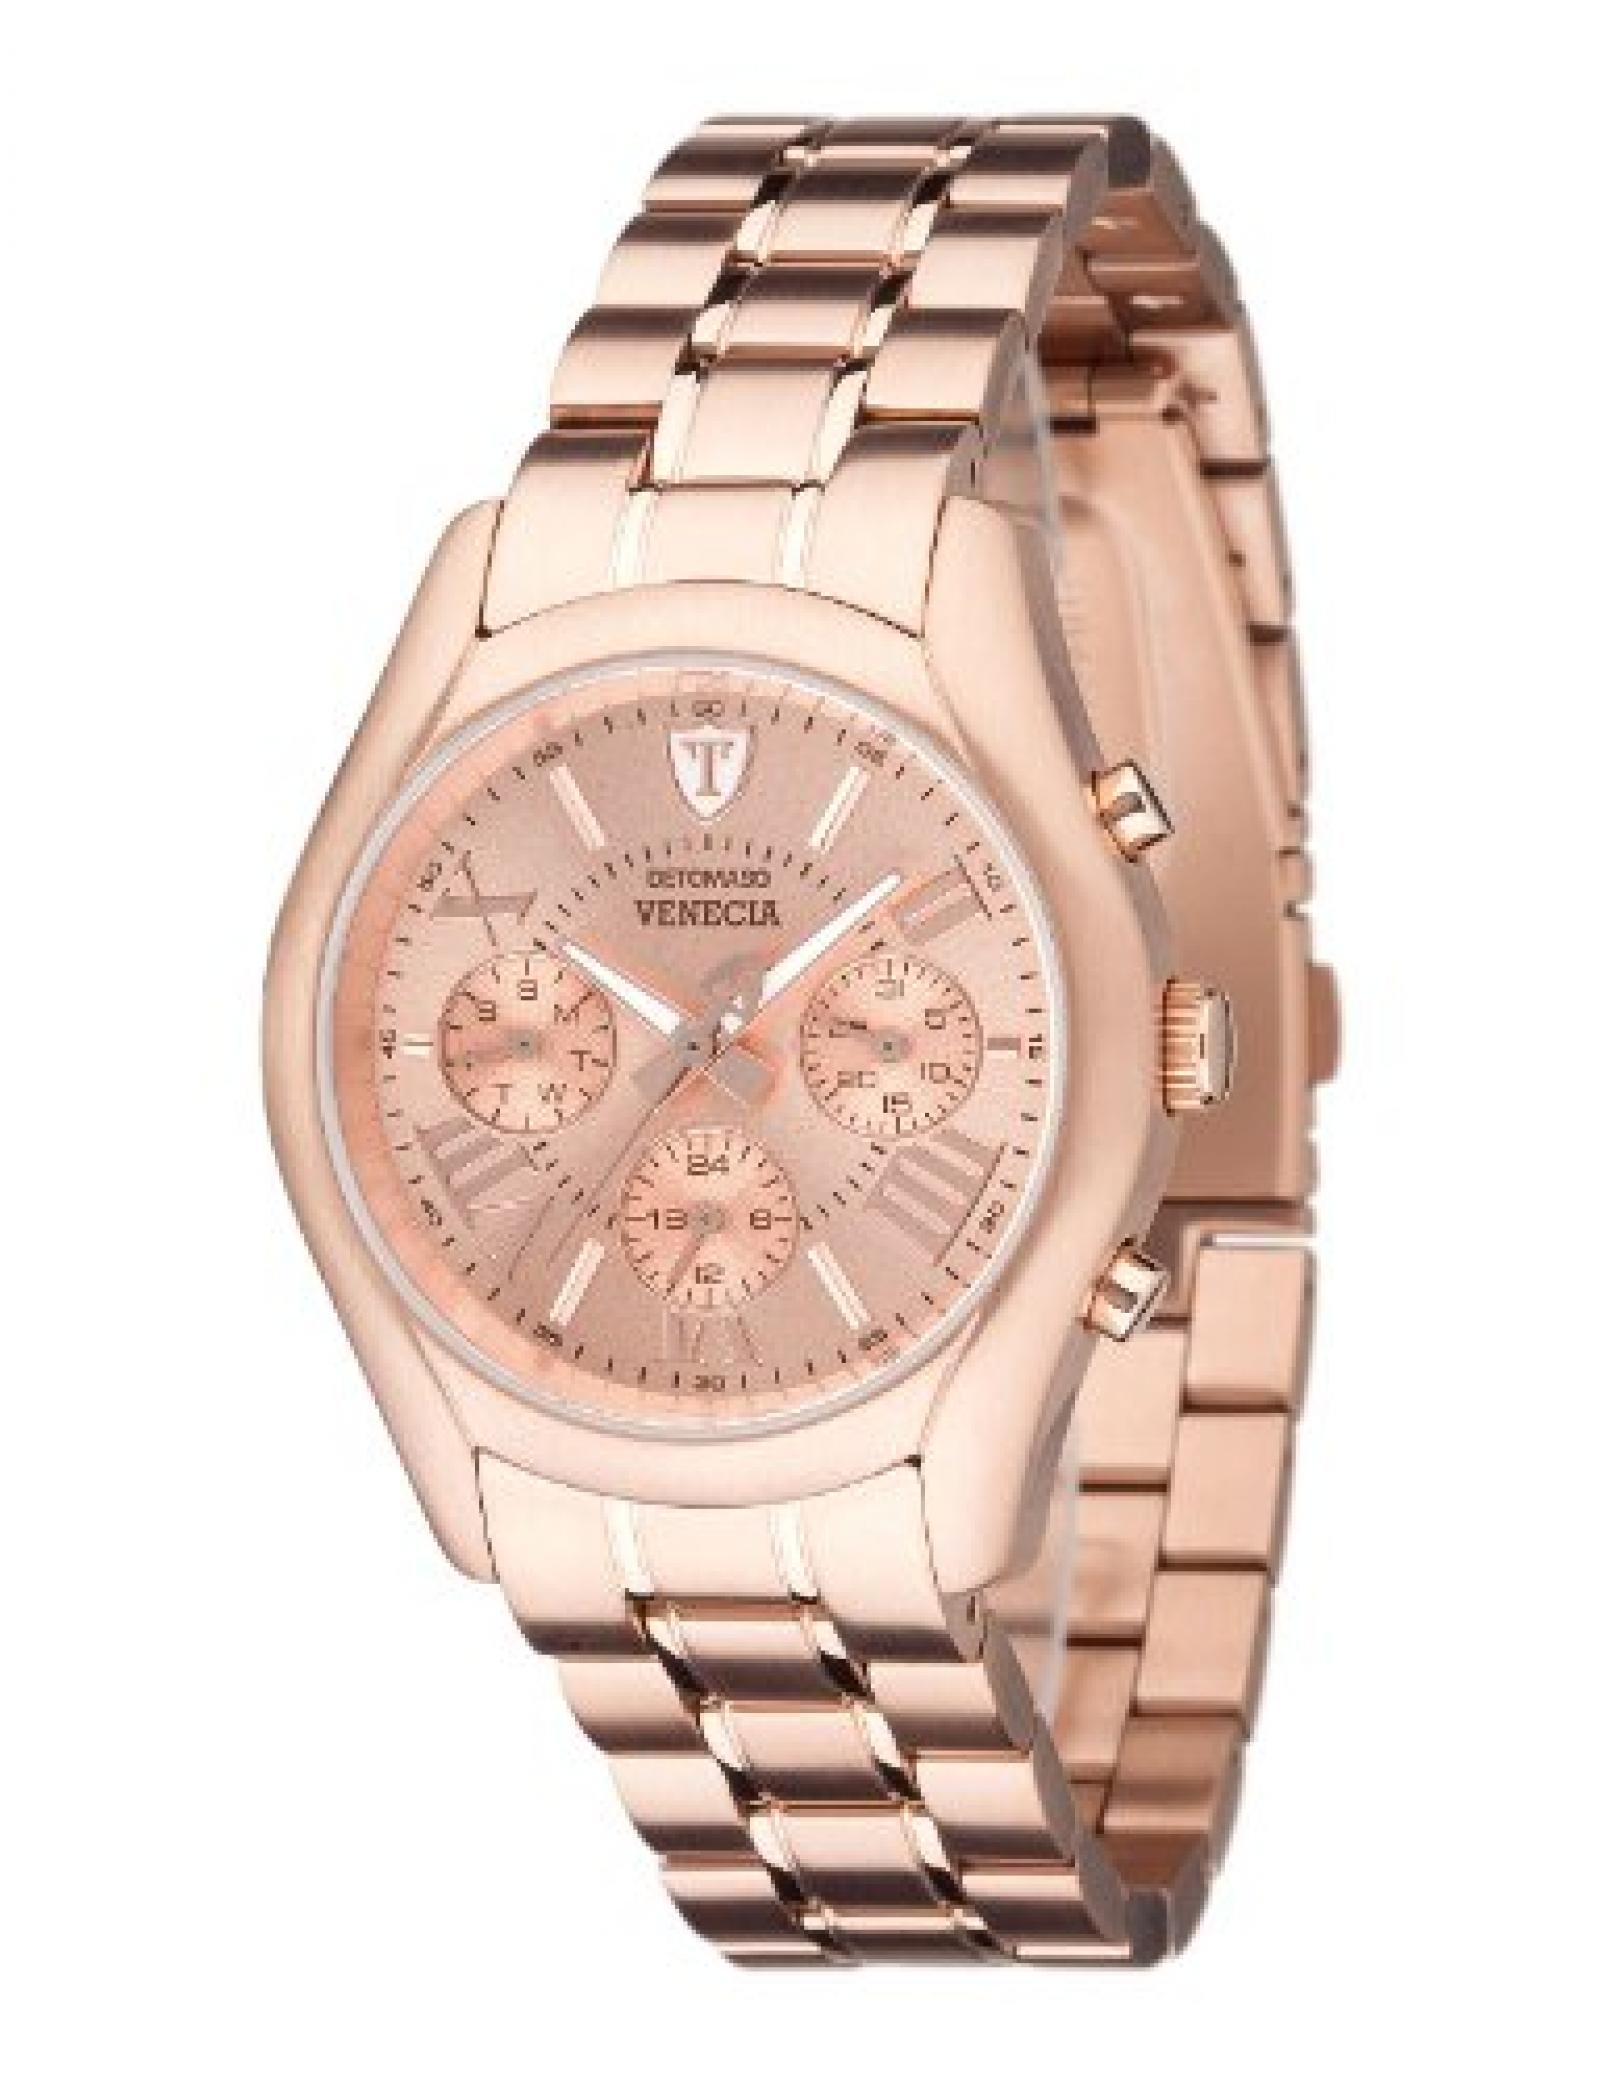 Detomaso Damen-Armbanduhr VENECIA Multifunction Rosegold Analog Quarz Edelstahl DT3020-A